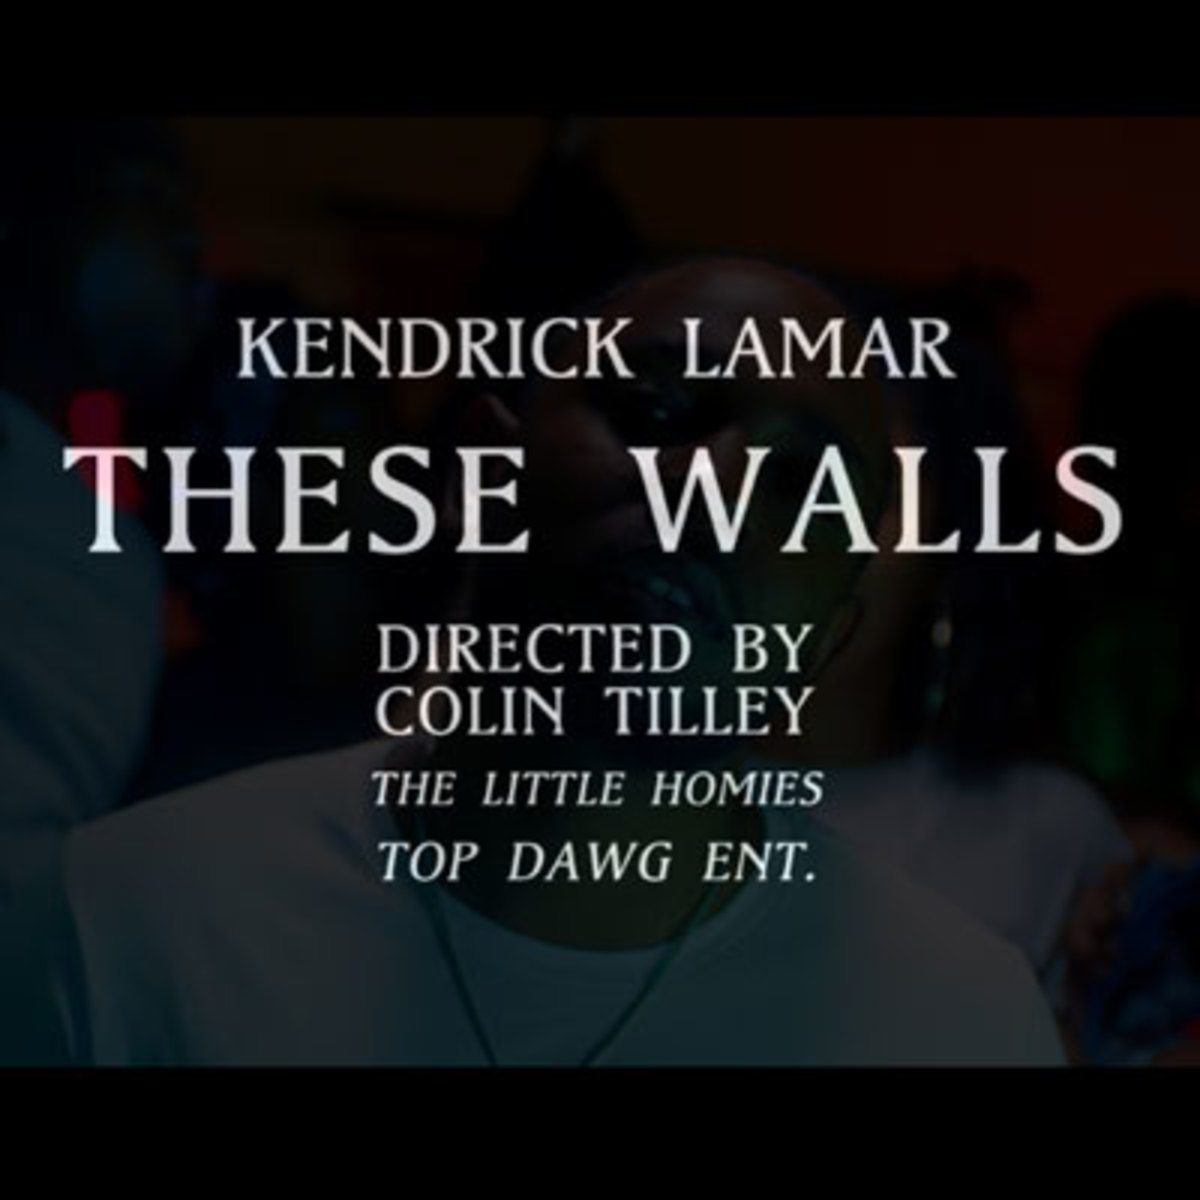 kendrick-lamar-these-walls.jpg